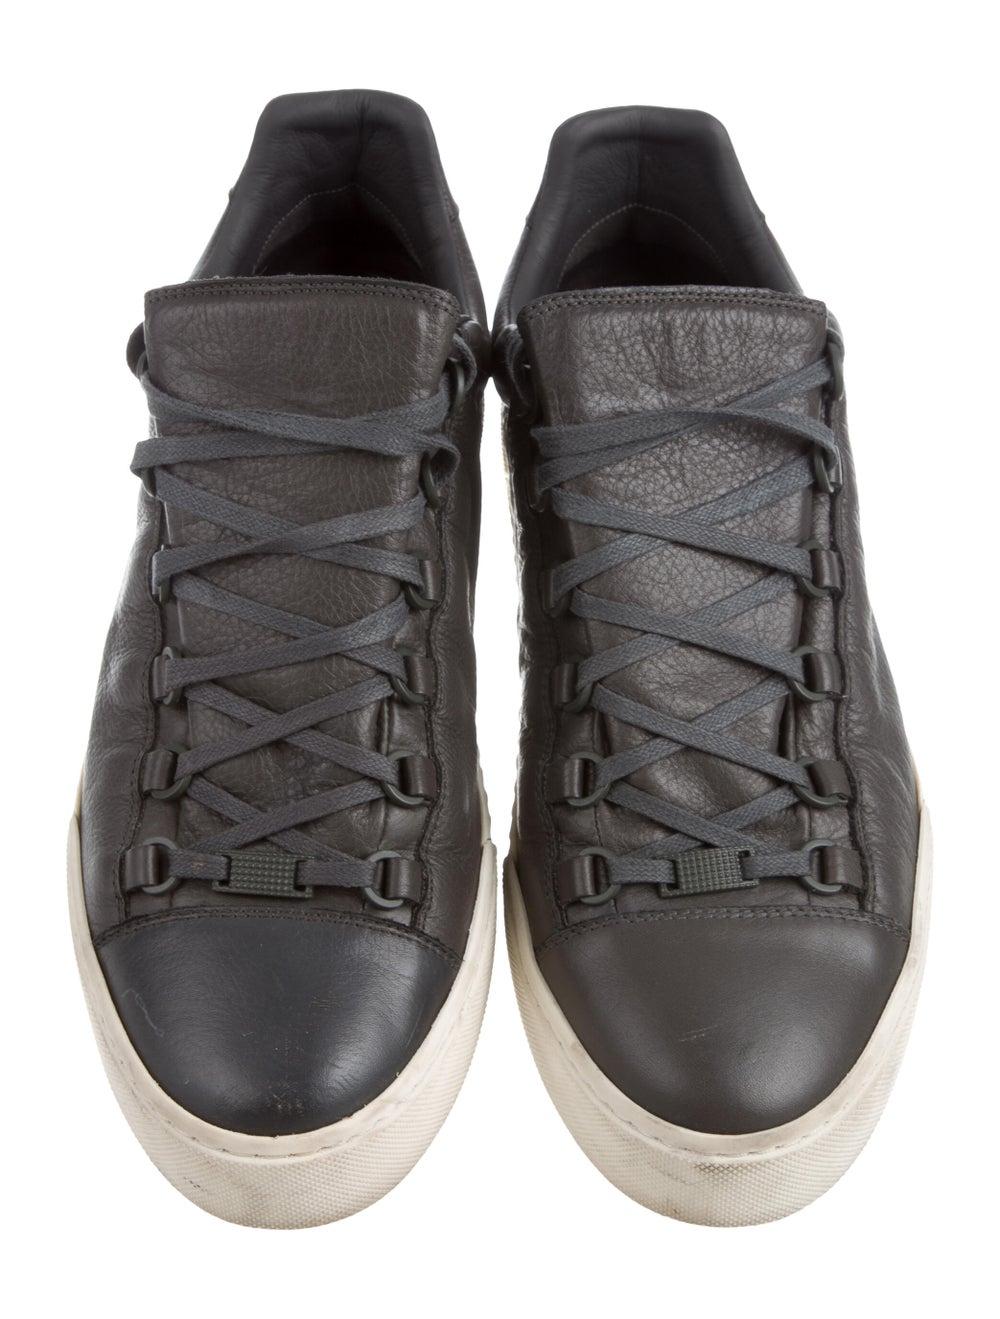 Balenciaga Cap-Toe Low-Top Sneakers Gris - image 3